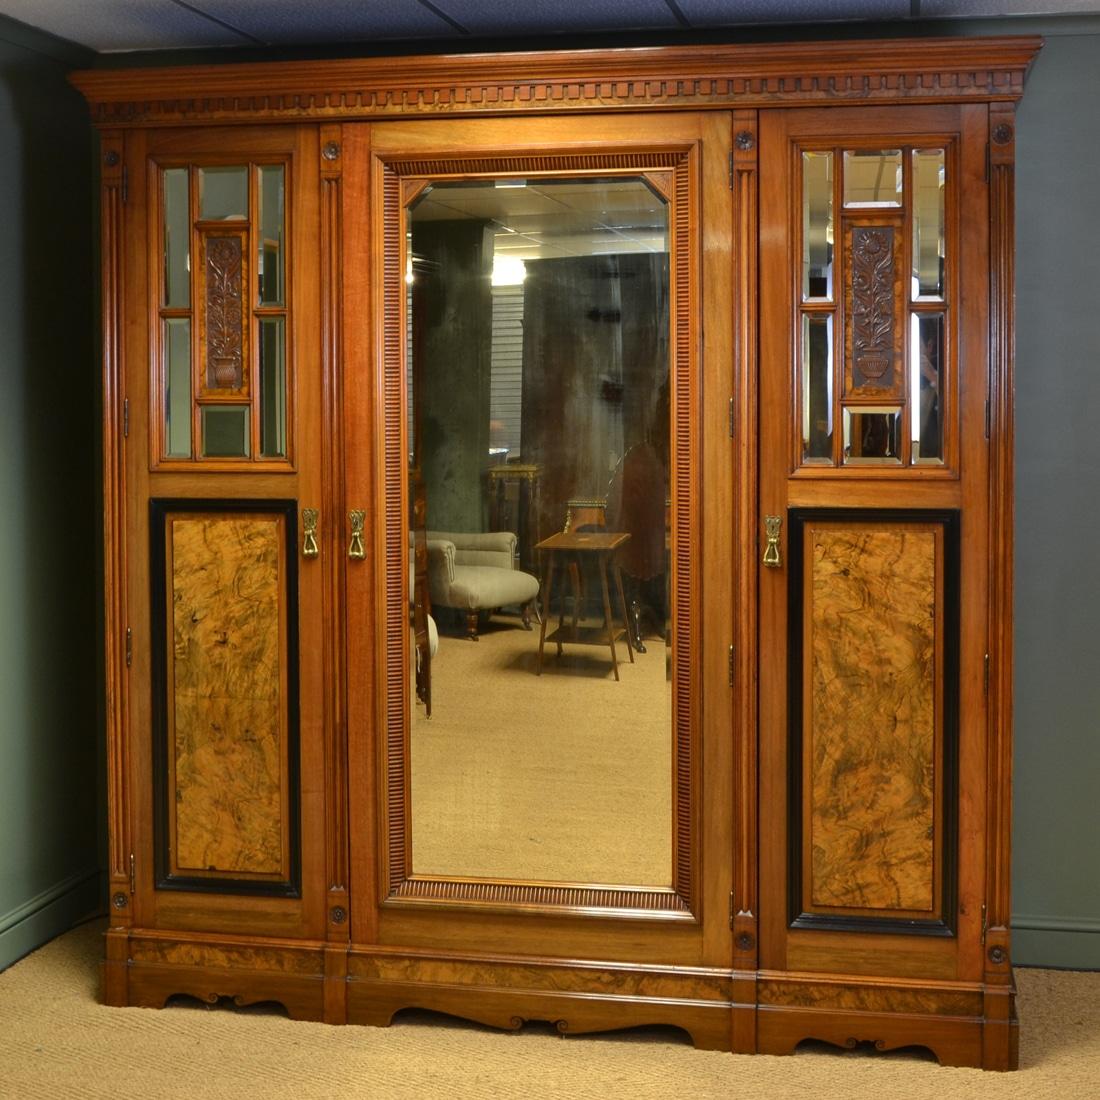 Magnificent Huge Victorian Golden Walnut Antique Triple Wardrobe by Harrison & Son Burnley